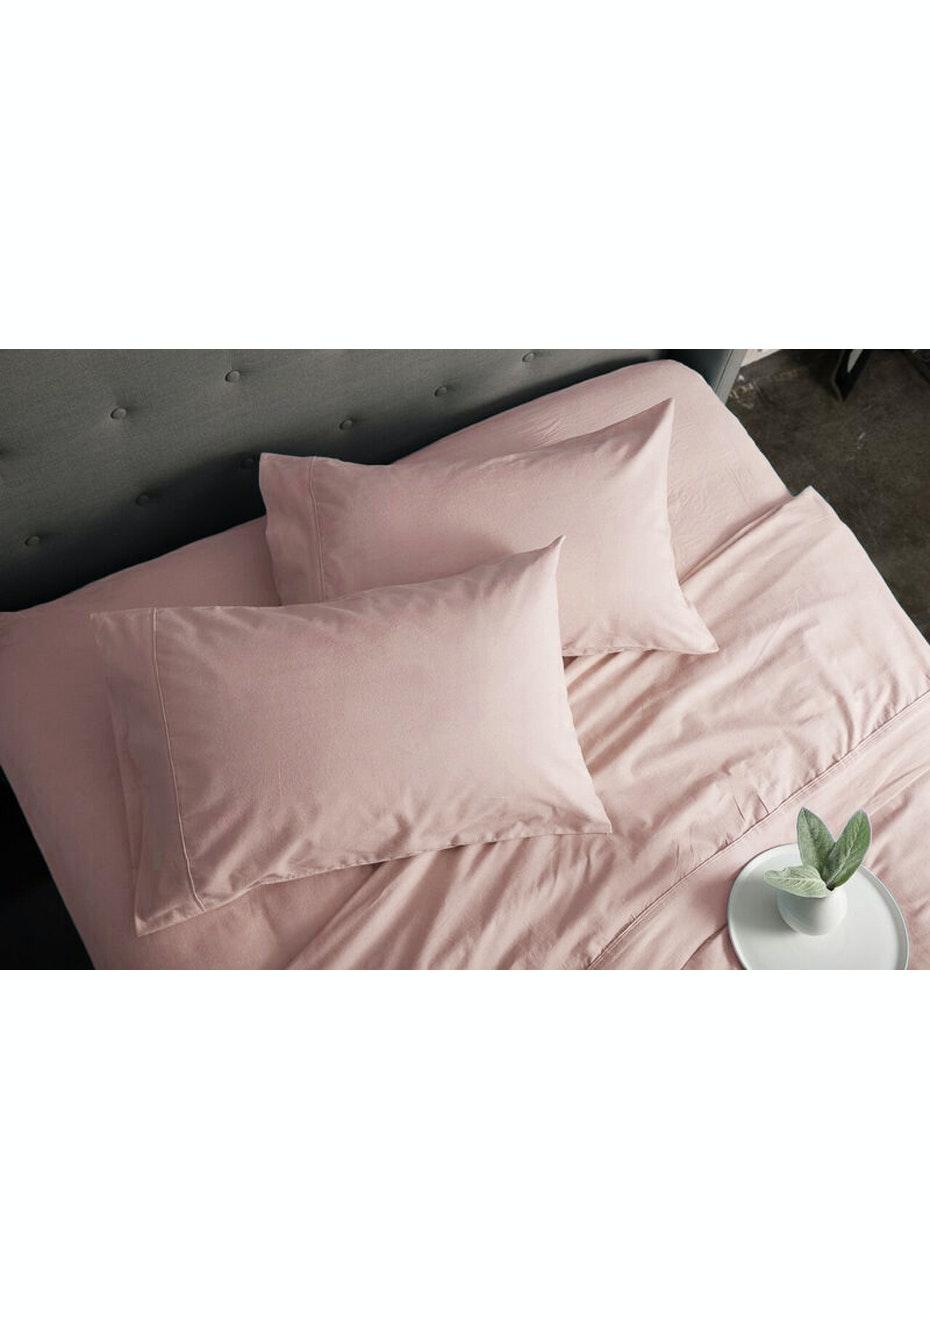 Charming Sheraton Flannelette Sheet Set King Single Bed   Cameo Pink   Sheraton  Luxury Flannelette Sheet Sets   Onceit